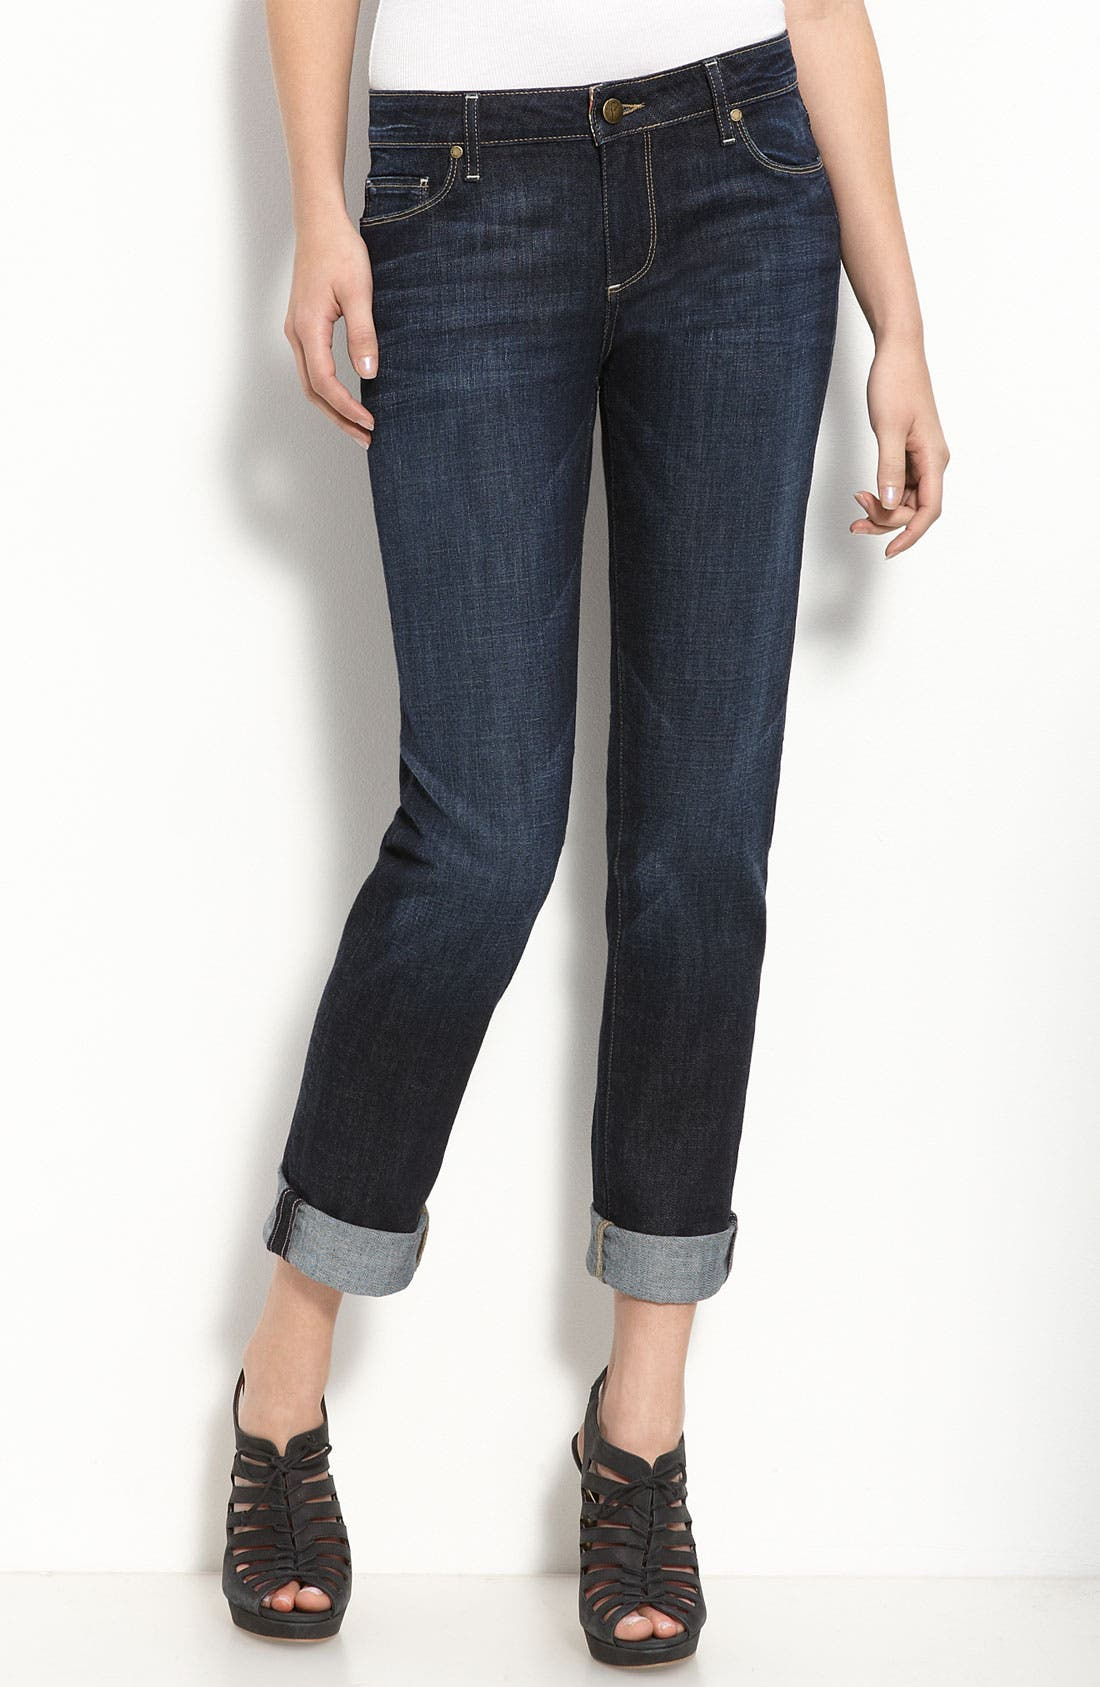 Main Image - Paige Denim 'Jimmy Jimmy' Stretch Jeans